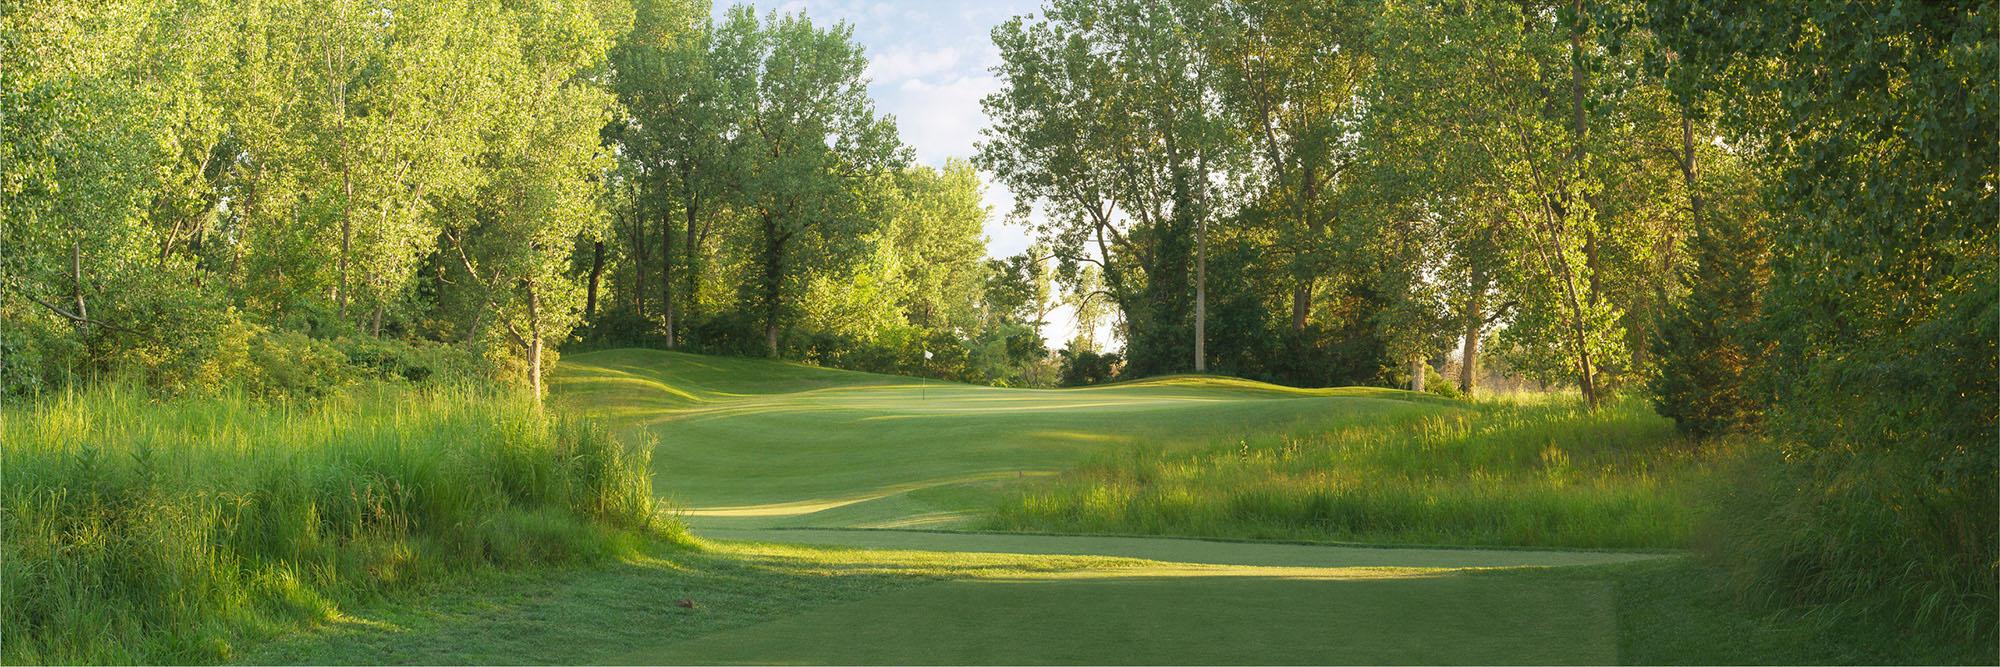 Golf Course Image - Dakota Dunes No. 14